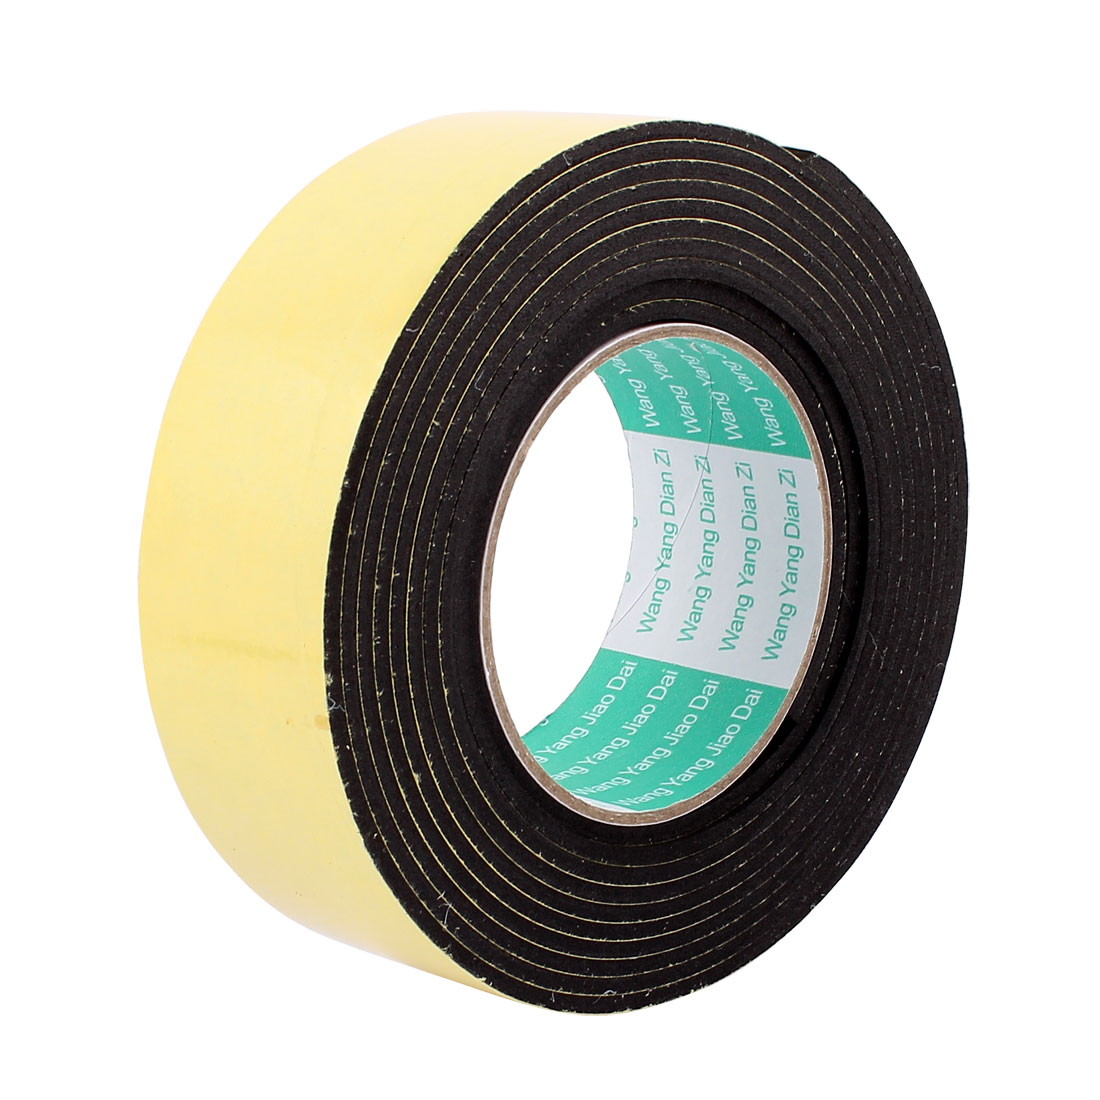 4.5CM Wide 3Meters Length 4MM Thick Single Sided Sealing Shockproof Sponge Tape